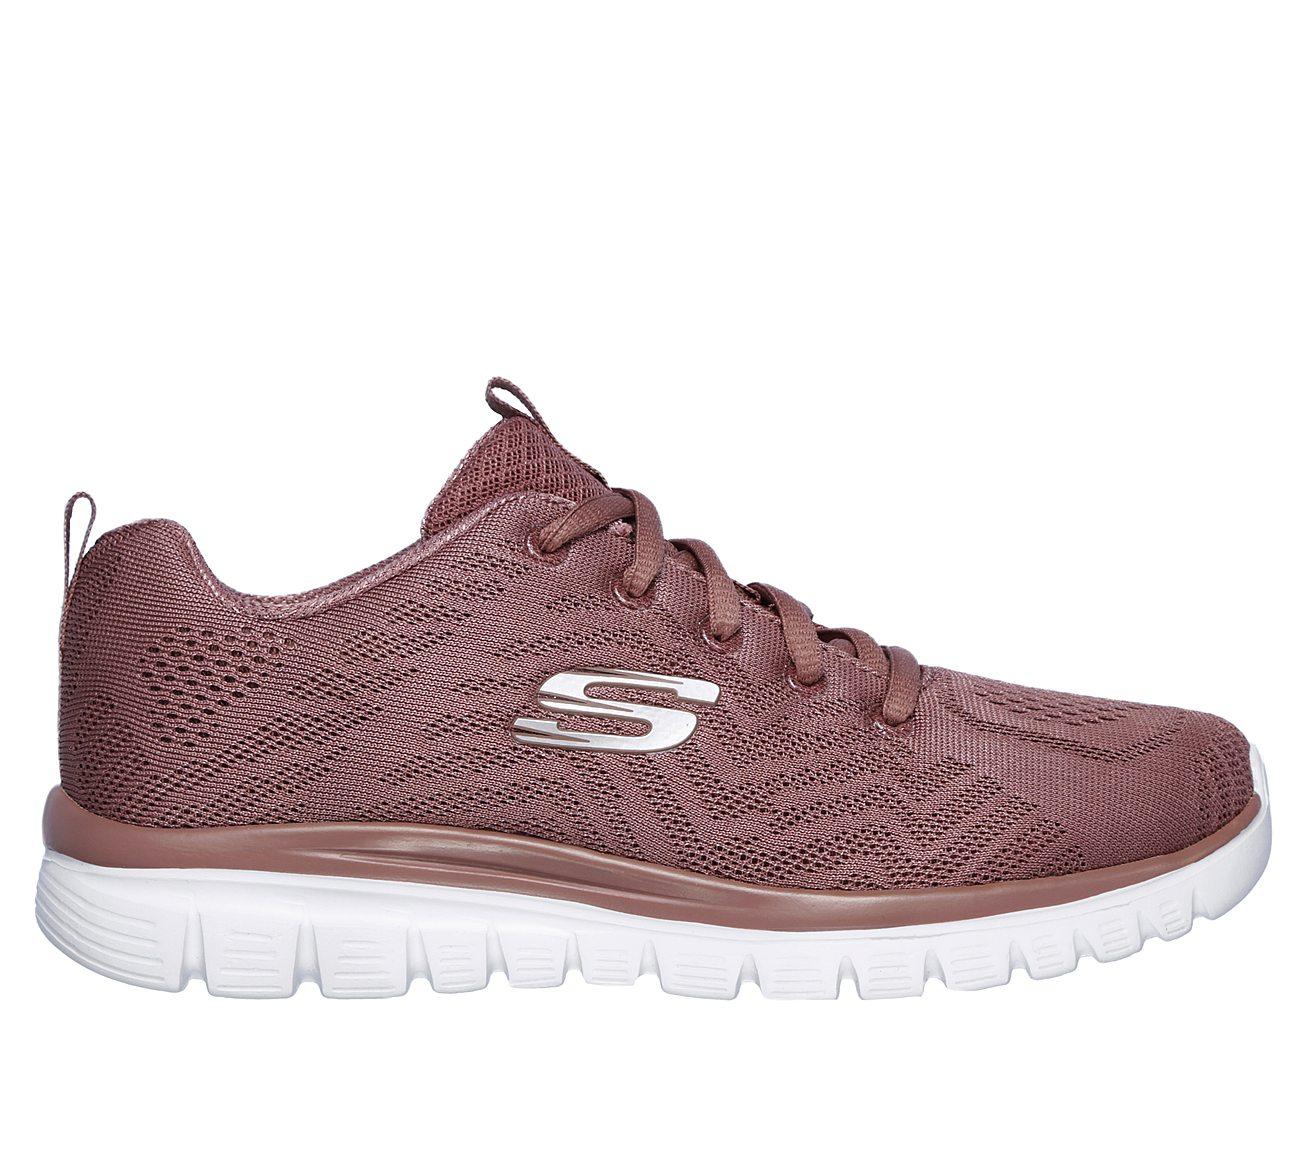 SKECHERS Women's Graceful Get Connected Sneakers, Charcoal